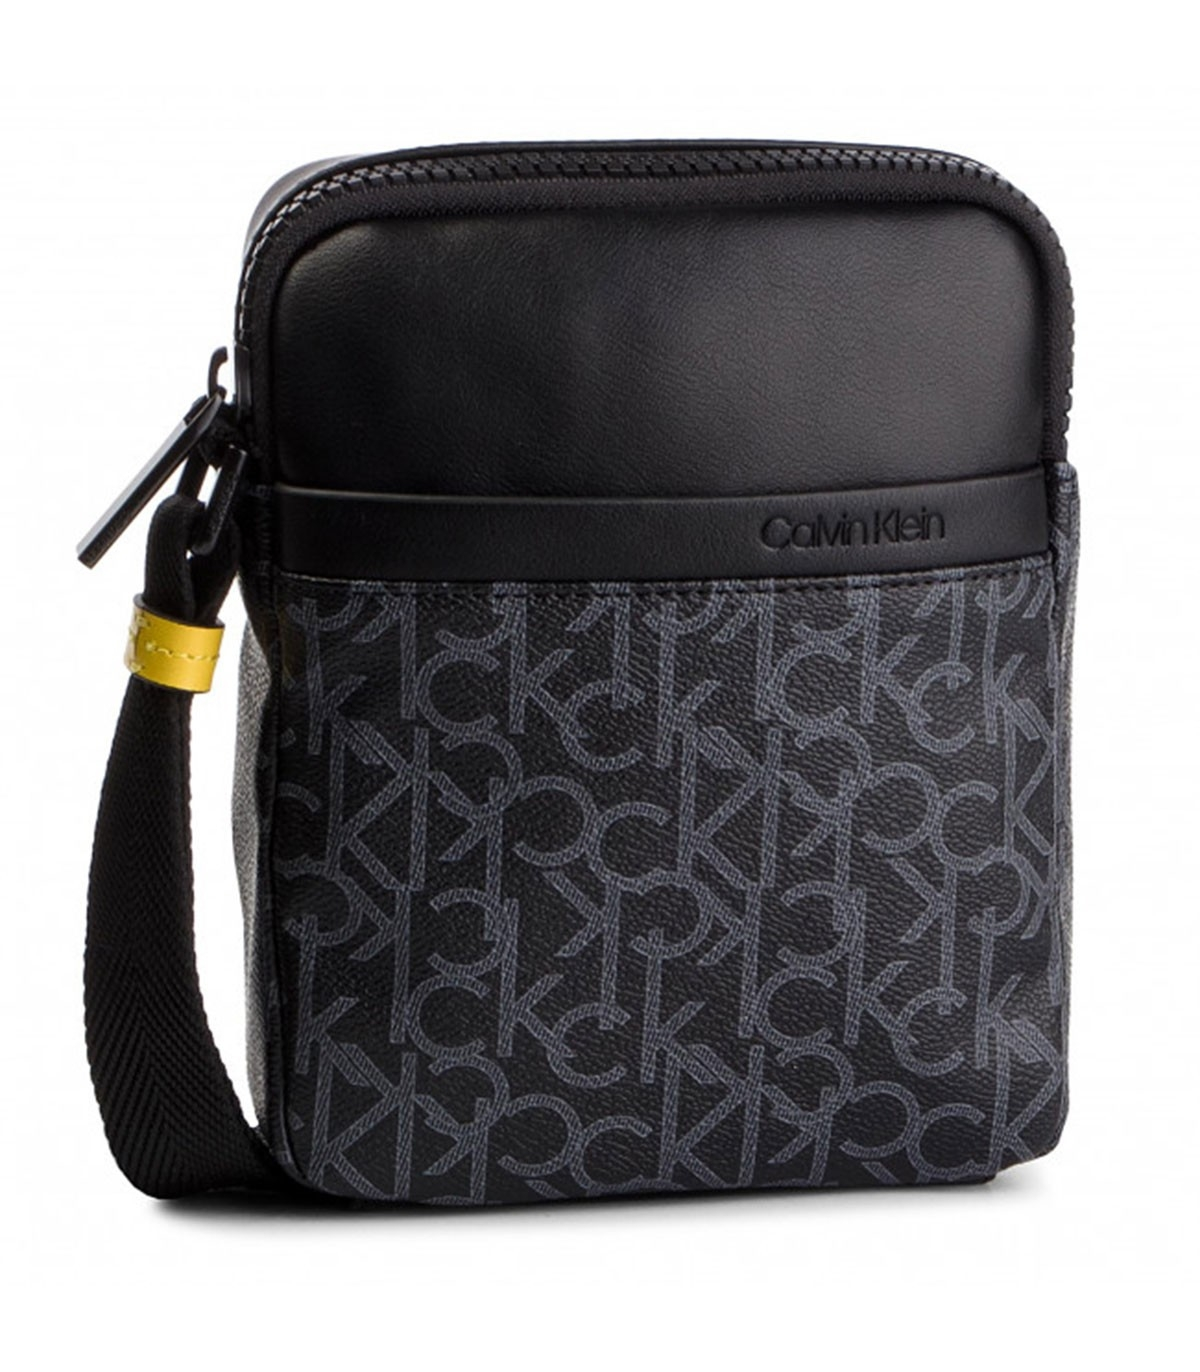 57f397862 Buy Calvin Klein Sling bag